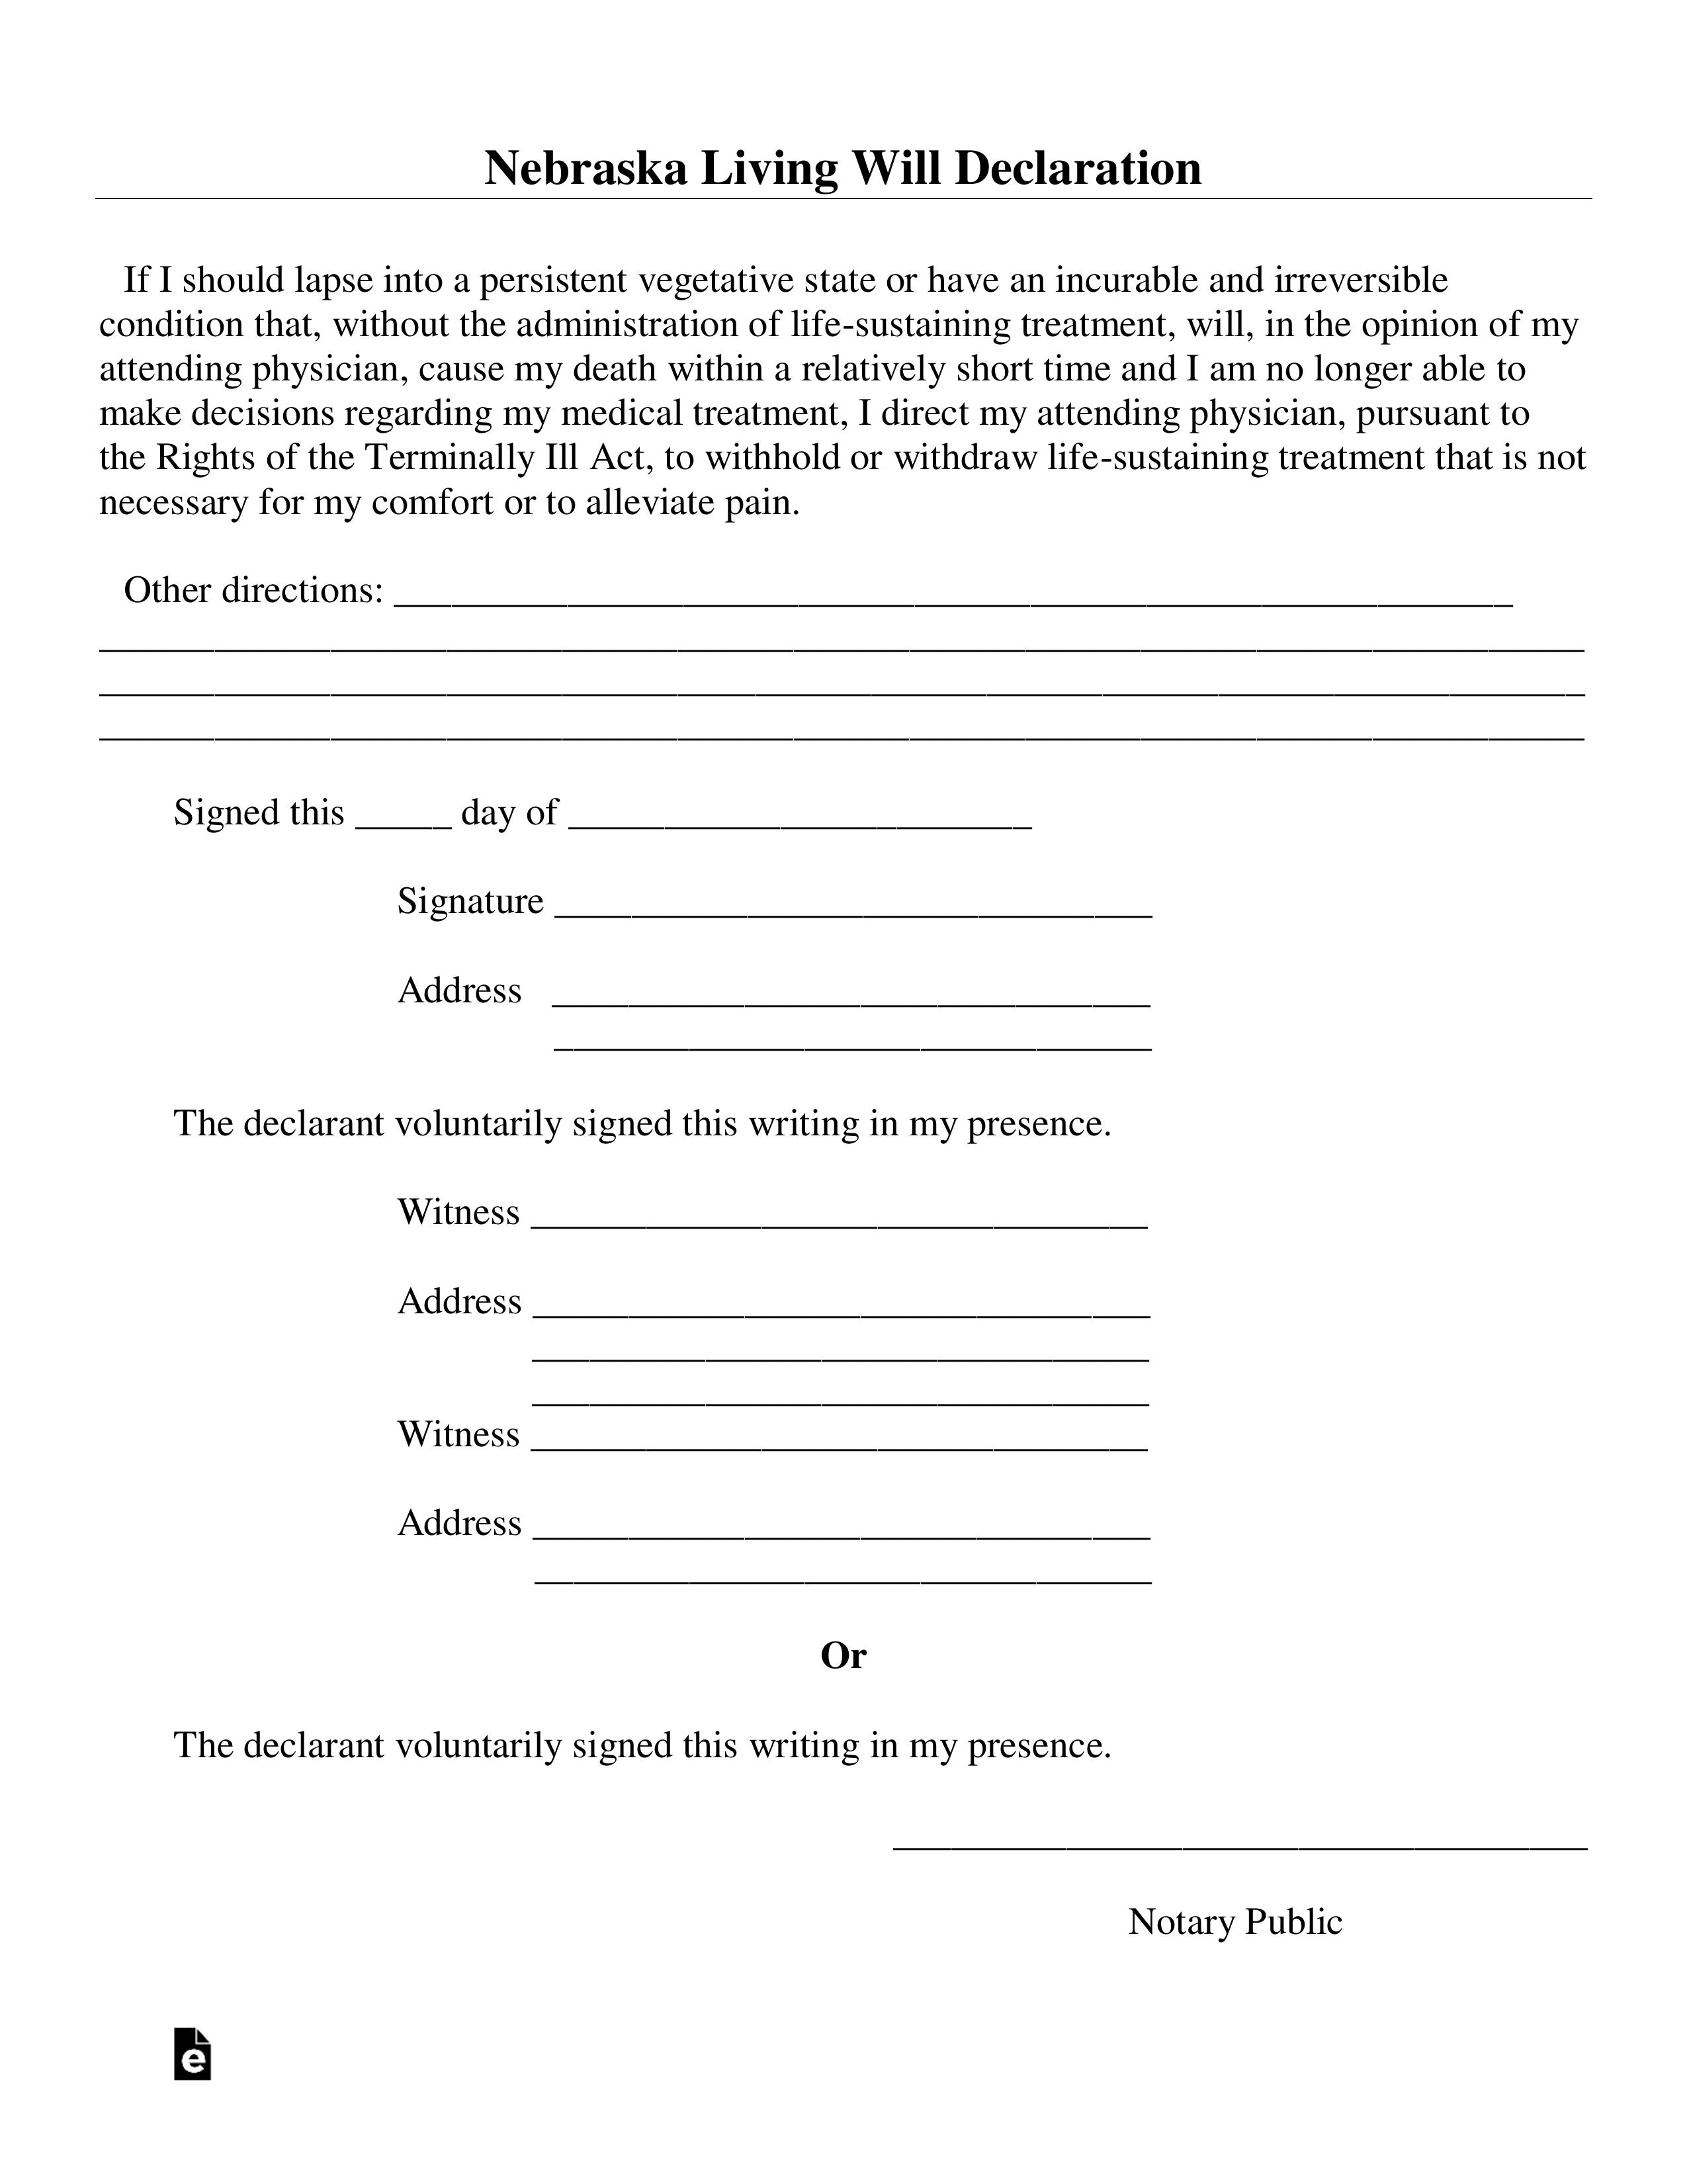 Free Nebraska Living Will Declaration Form PDF Word